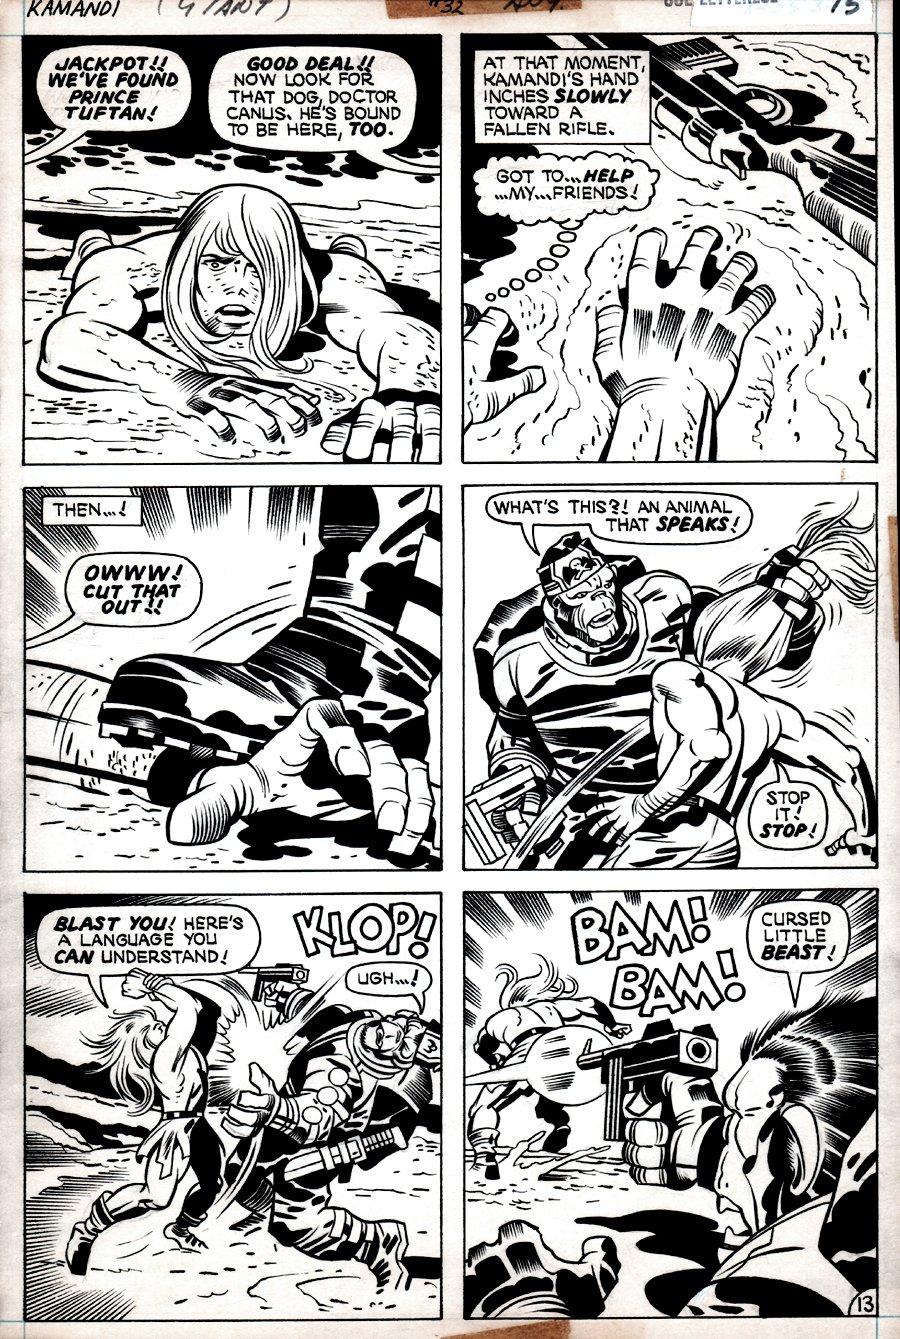 Kamandi #32 p 13 (KAMANDI BATTLES GORILLA COMMANDOS!) 1975